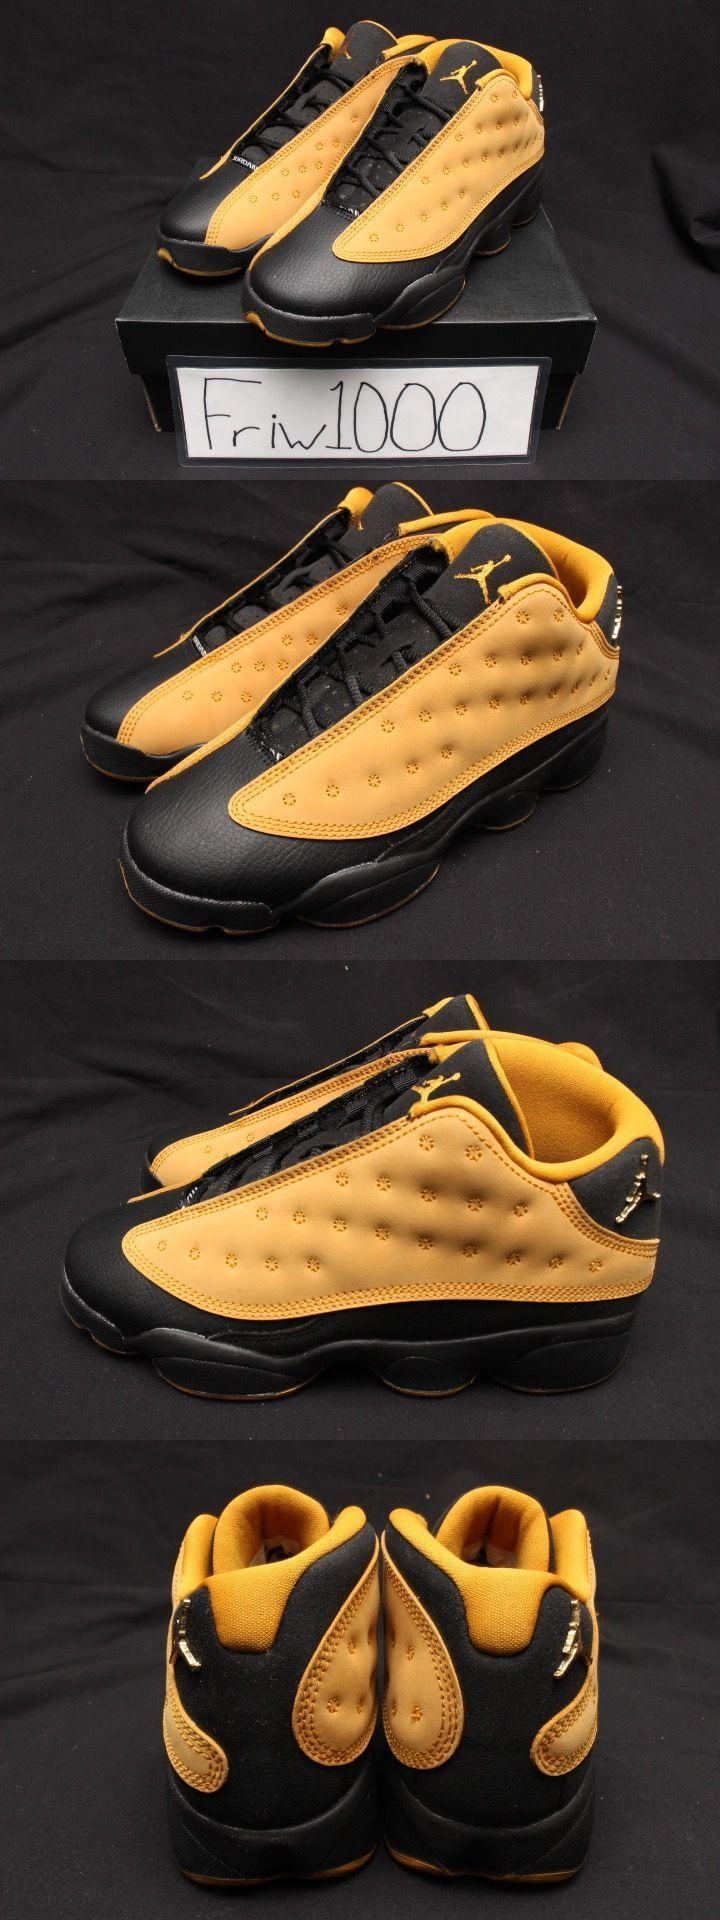 Hot Cheap Sale Nike Air Jordan 13 Low Cheap sale Chutney